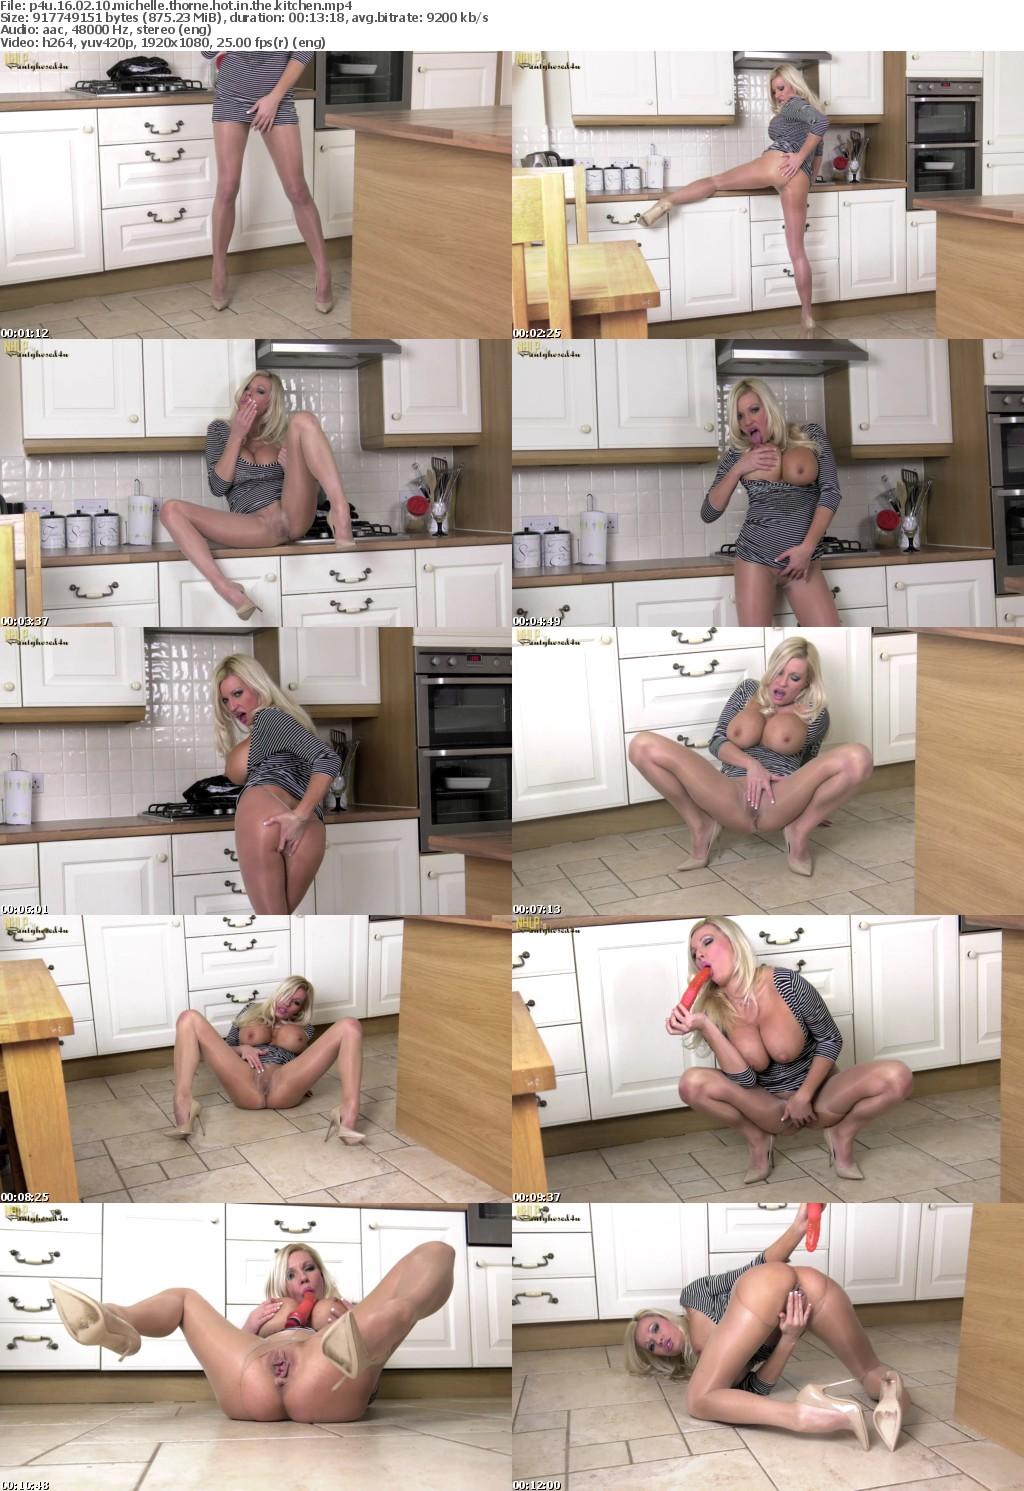 Pantyhosed4U 16 02 10 Michelle Thorne Hot In The Kitchen XXX 1080p MP4-KTR